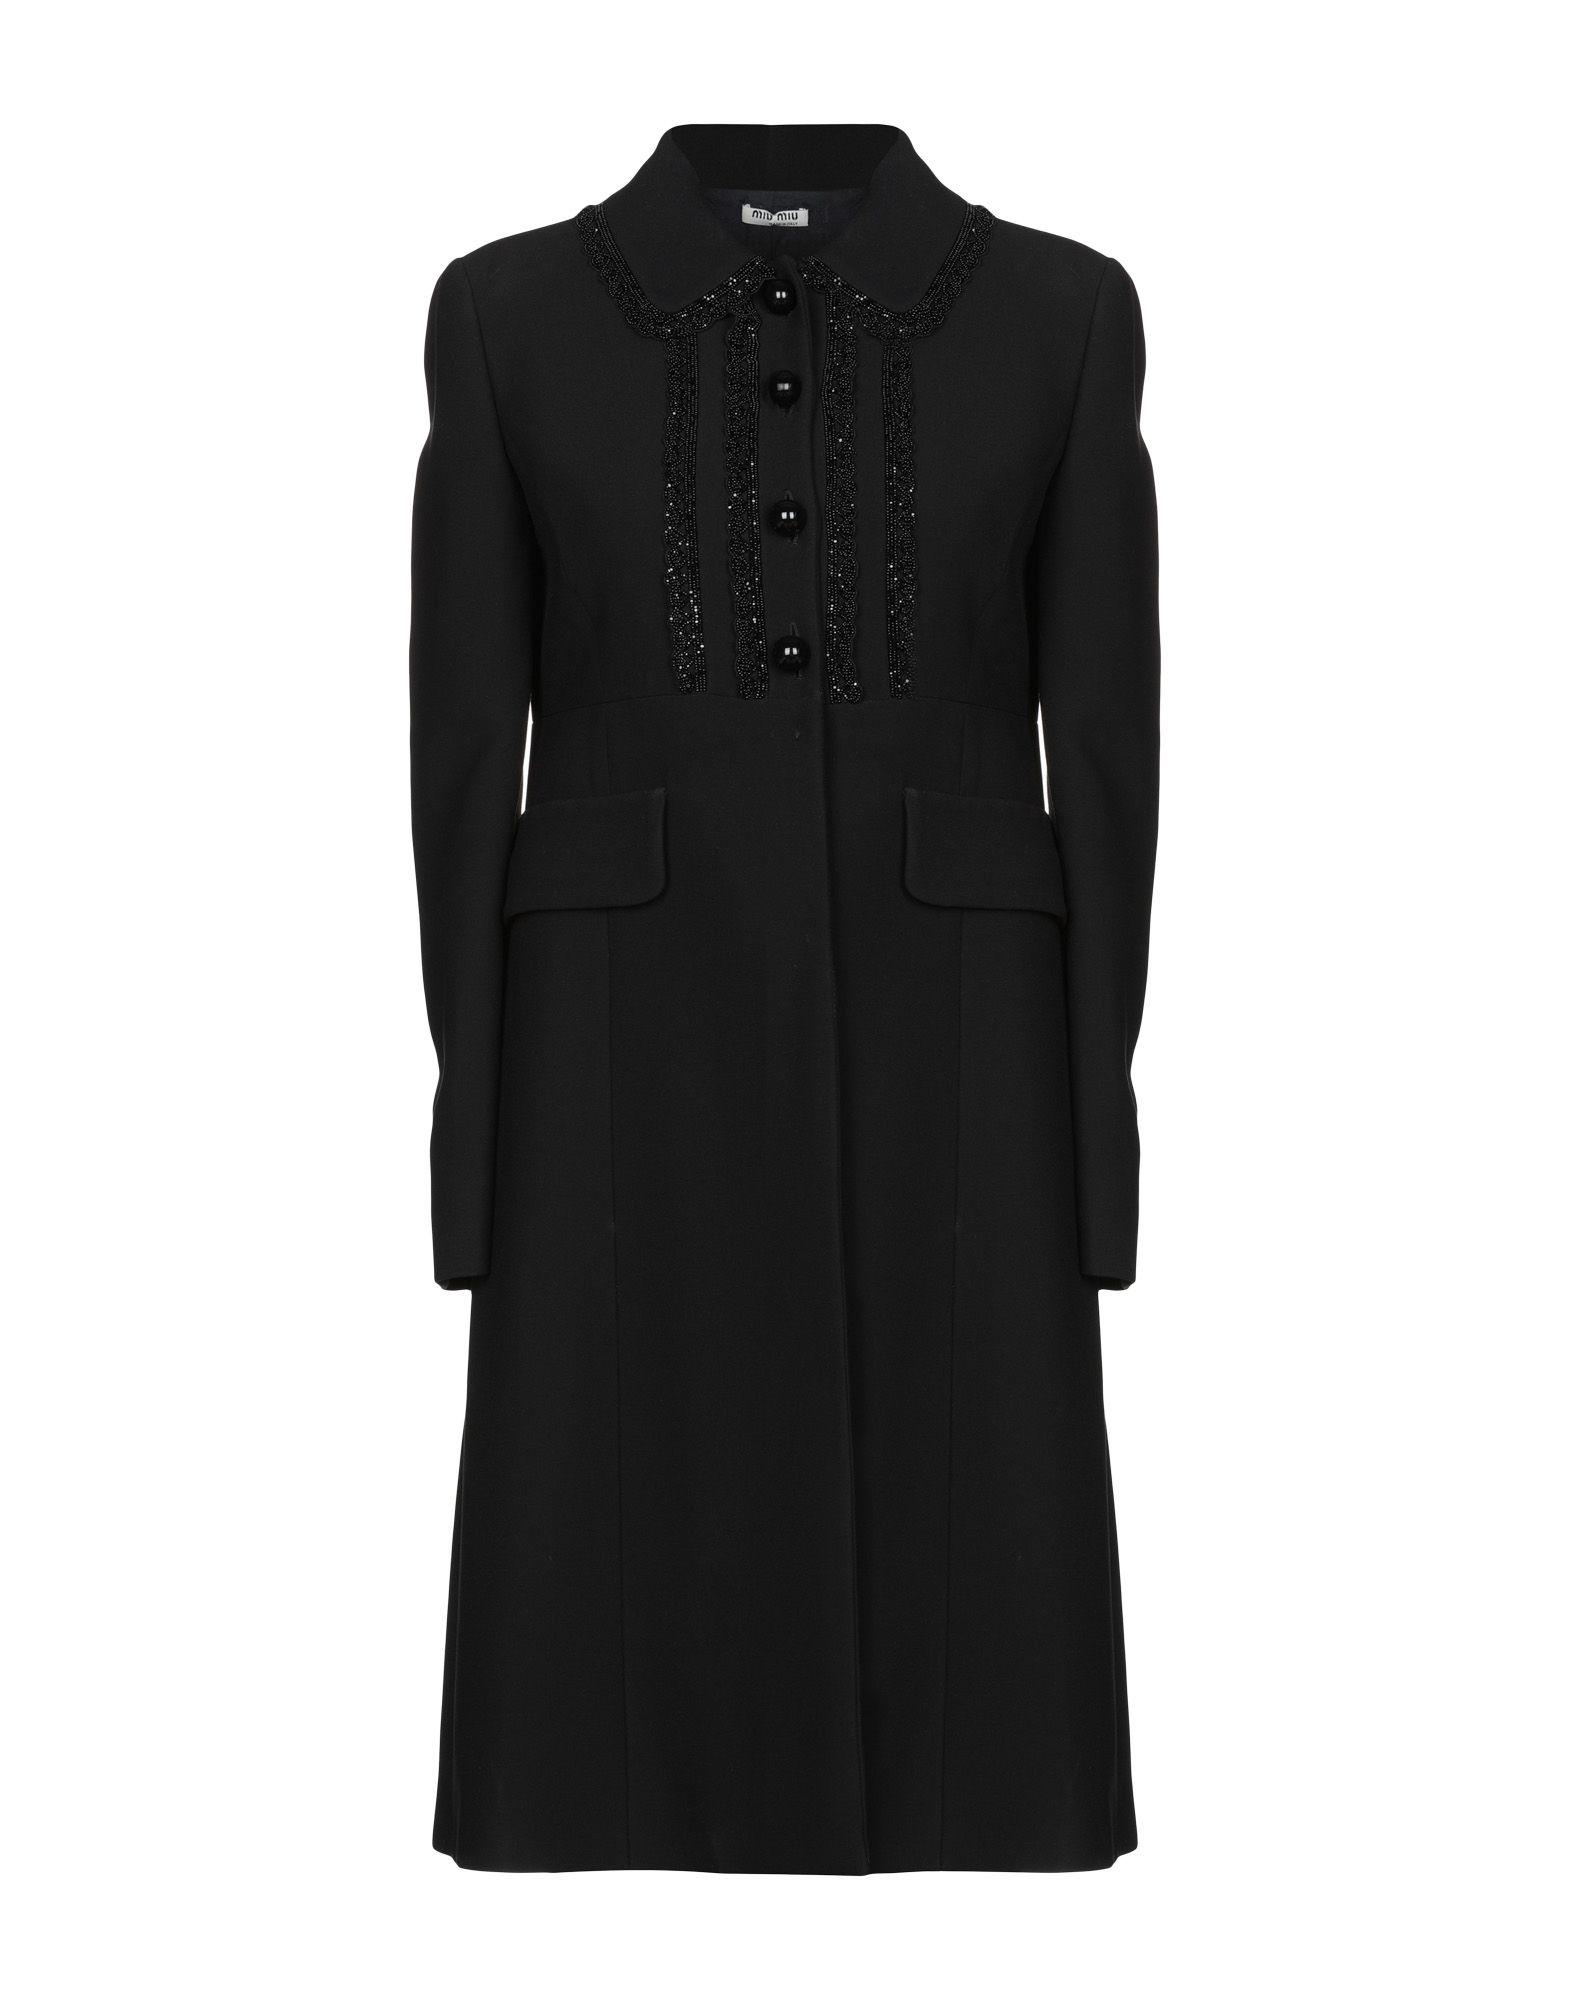 MIU MIU Пальто miu miu черный шерстяной кардиган